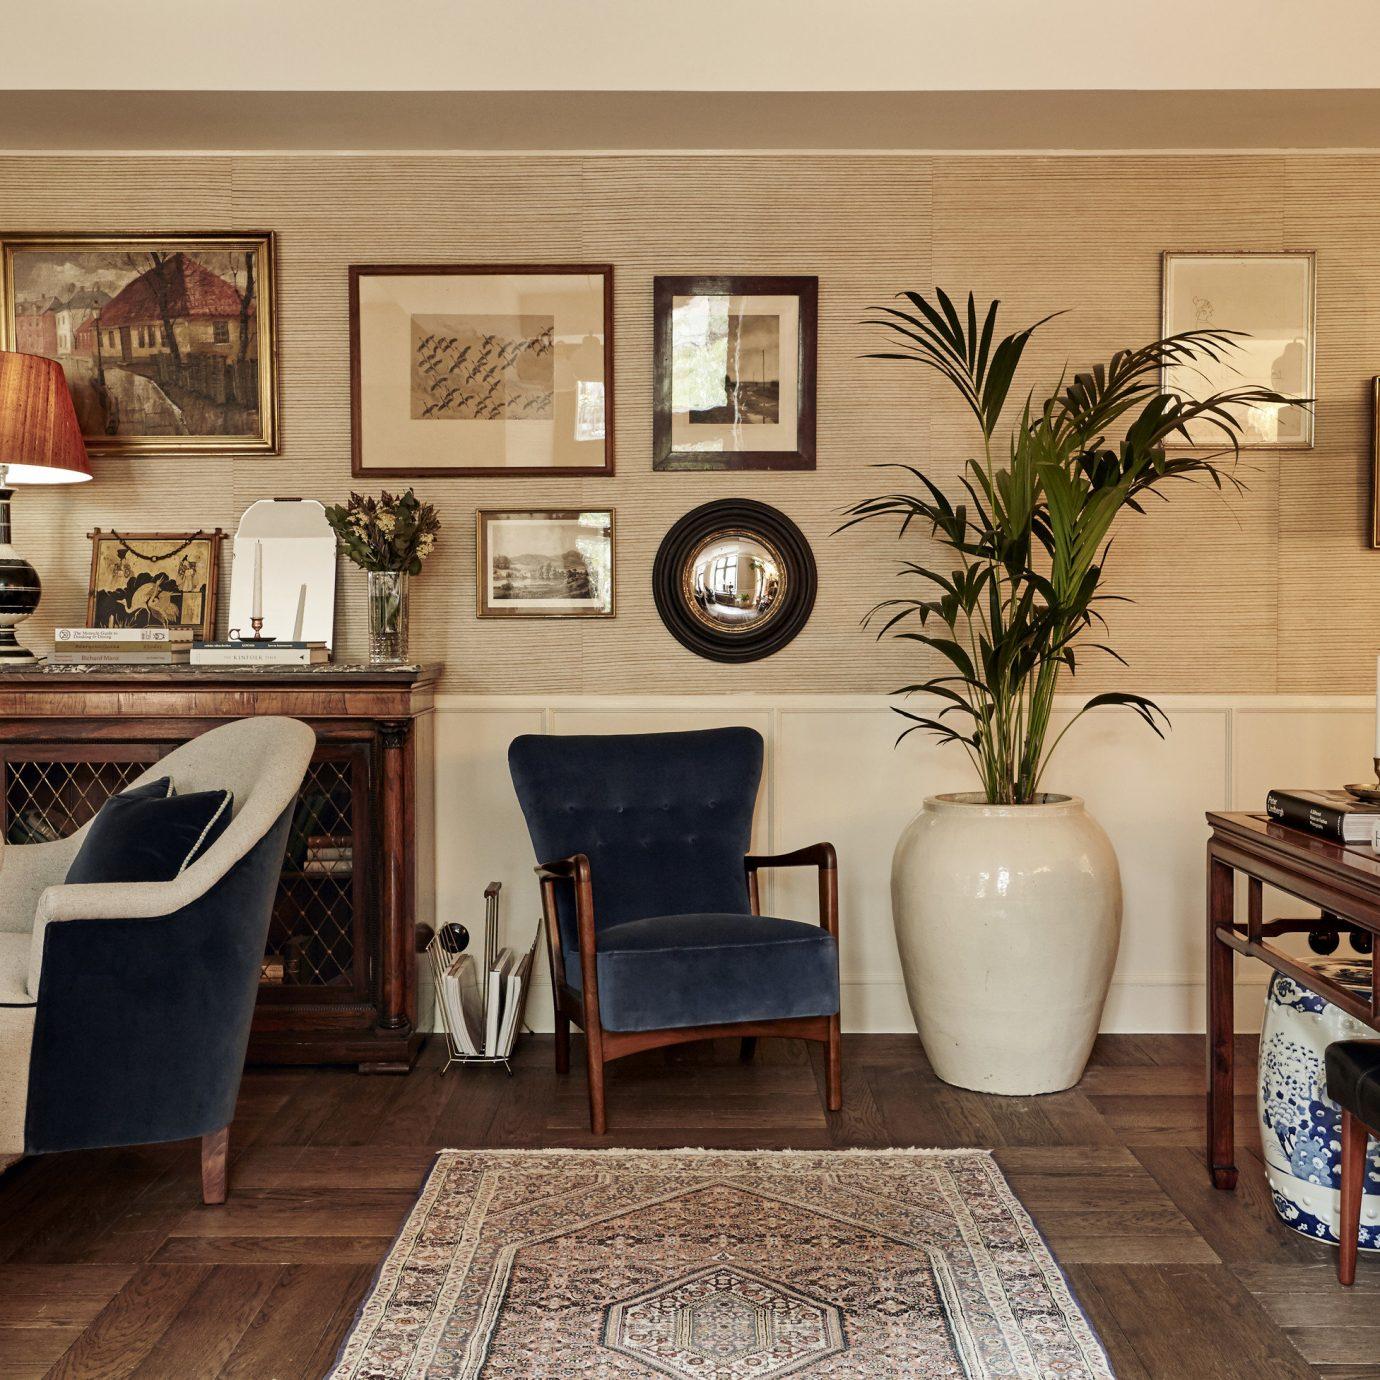 Boutique Hotels Copenhagen Denmark Hotels Trip Ideas living room home flooring chair hardwood interior designer